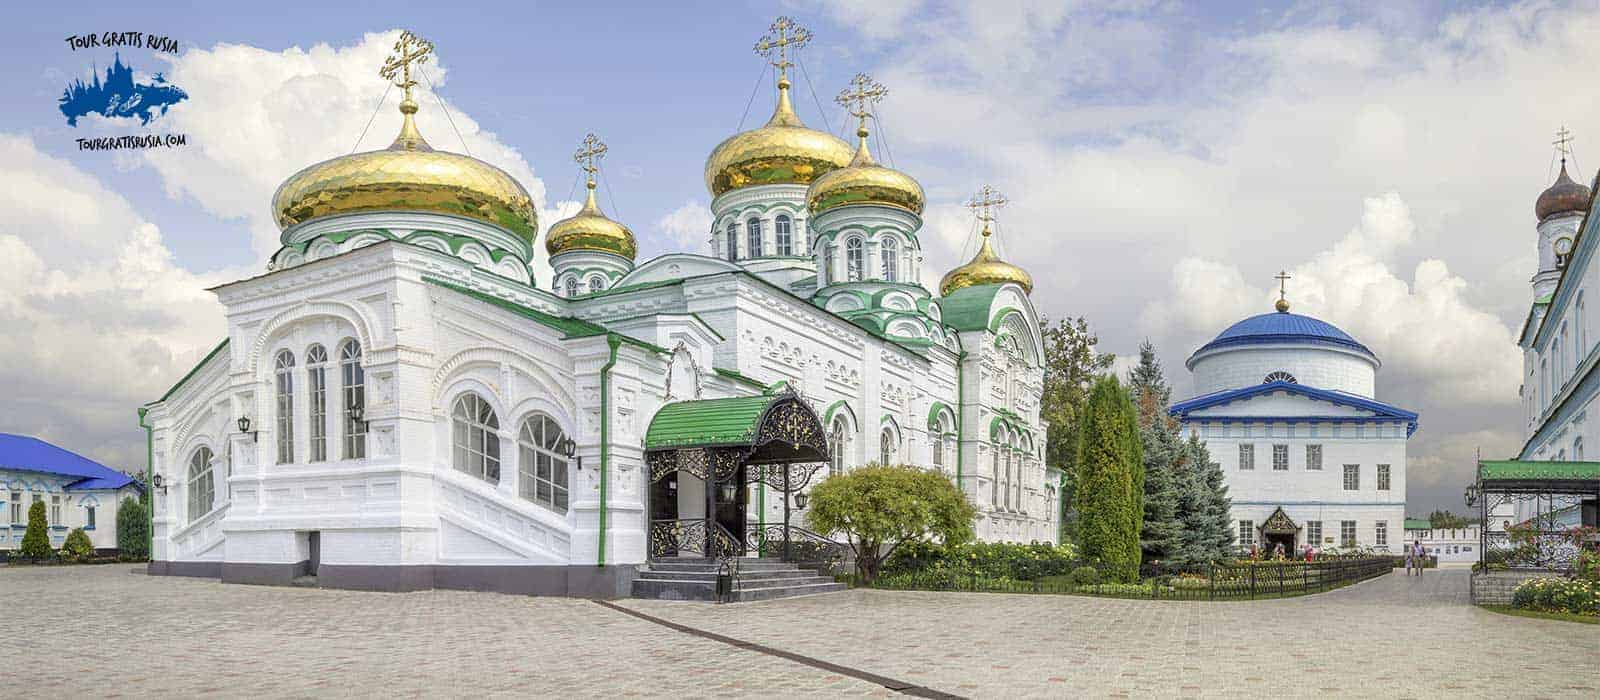 Excursión panorámica en Kazan y monasterio de Raifa